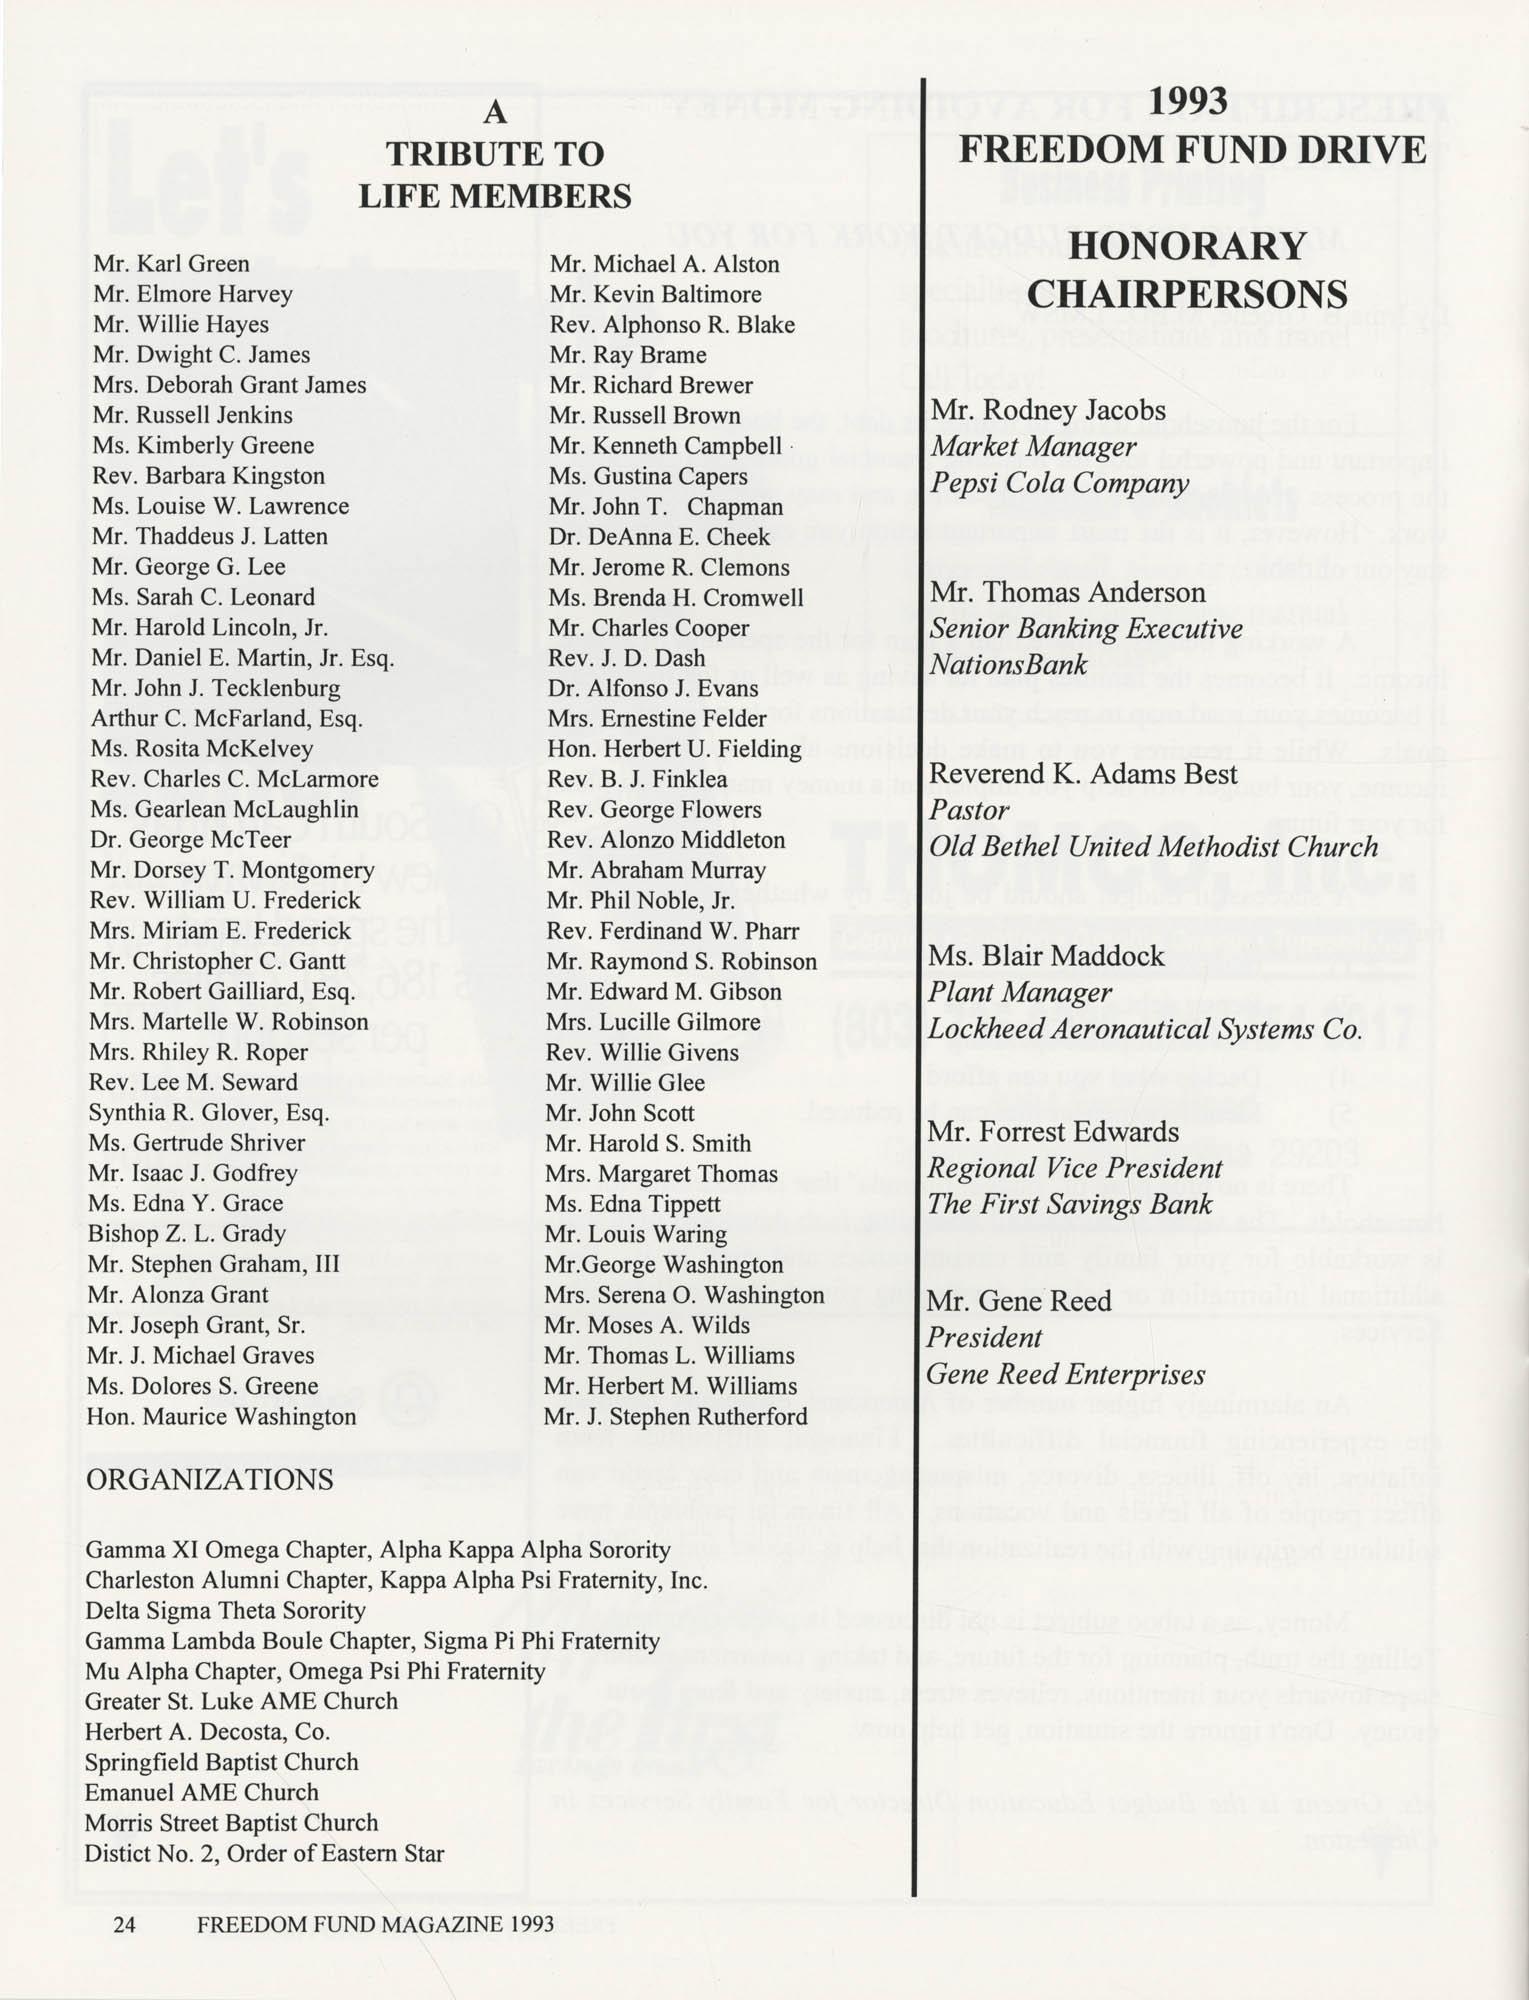 Freedom Fund Magazine, 1993, Page 24